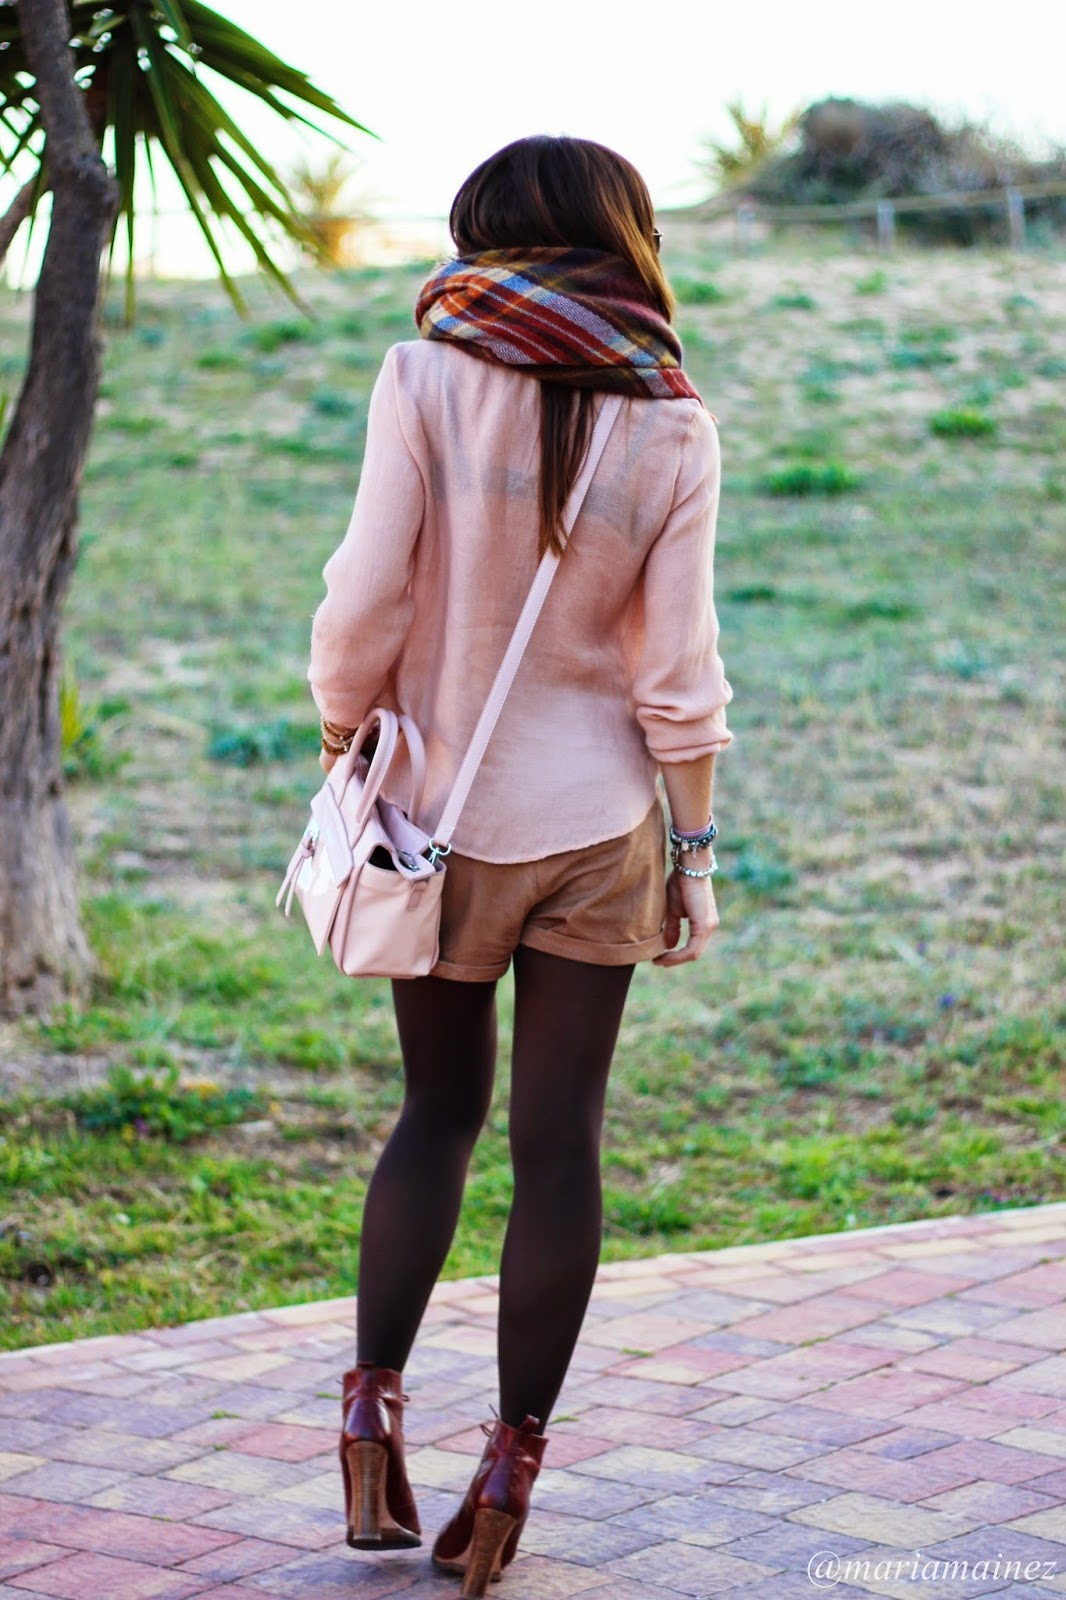 baltarini shoes - pepe moll bags - shorts ante - bufanda manta zara